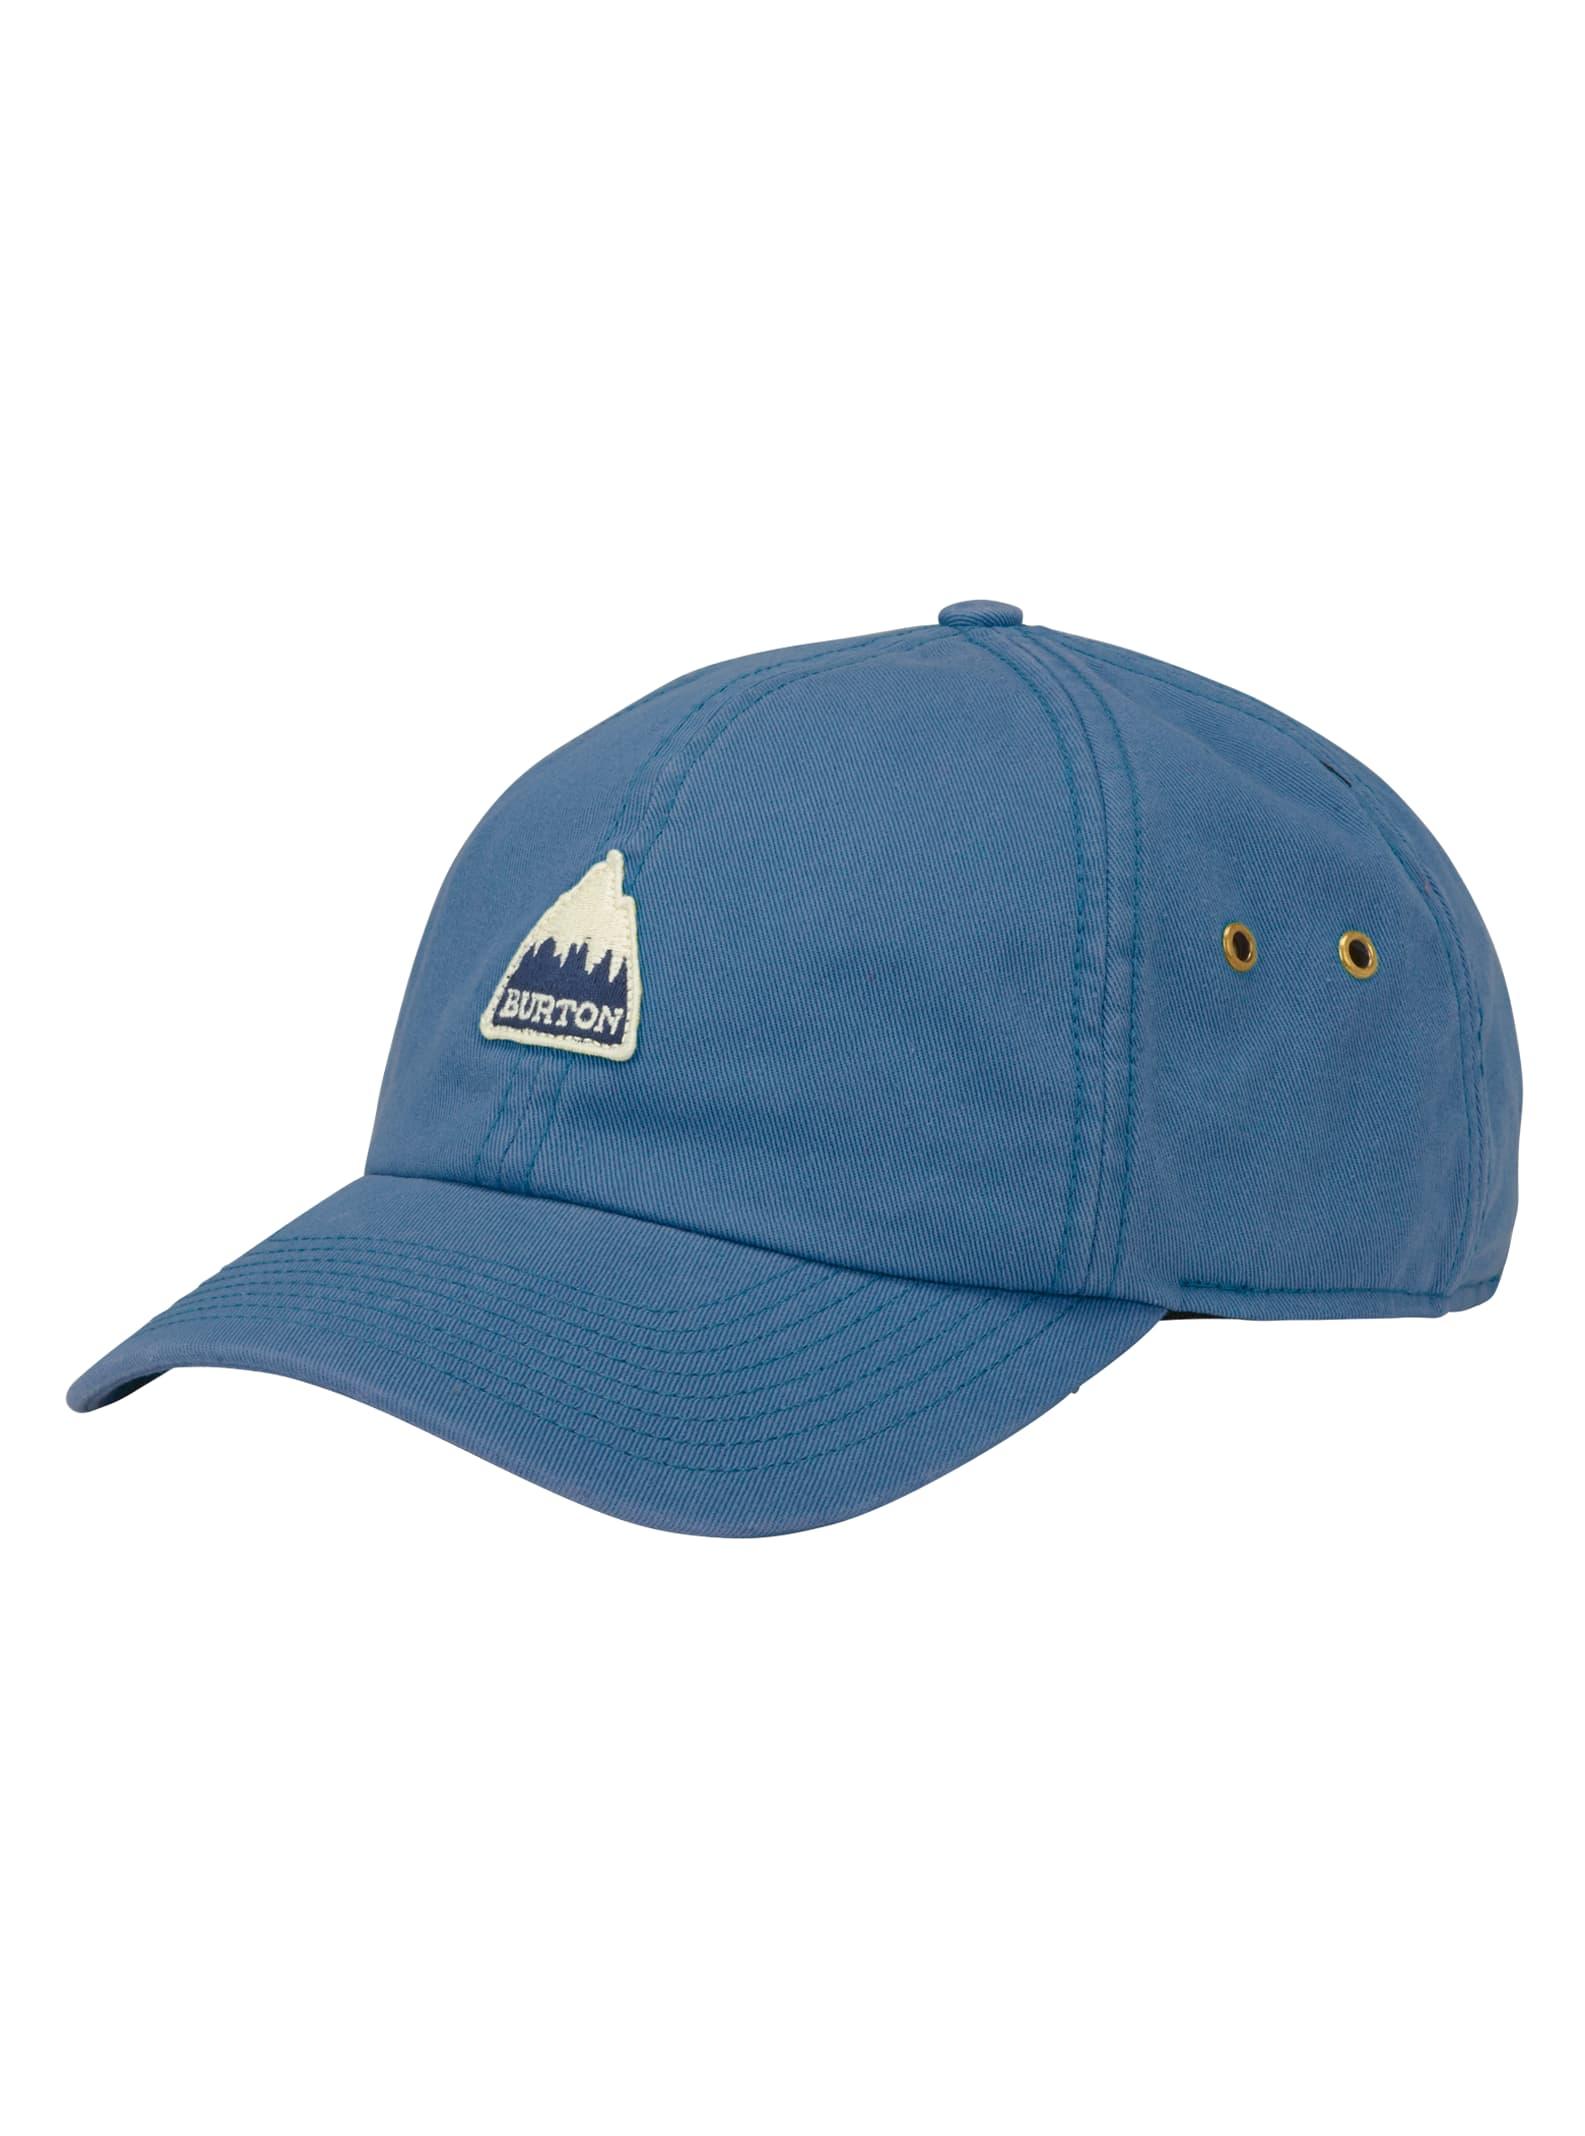 7ea32a03d84 Men s Hats   Beanies